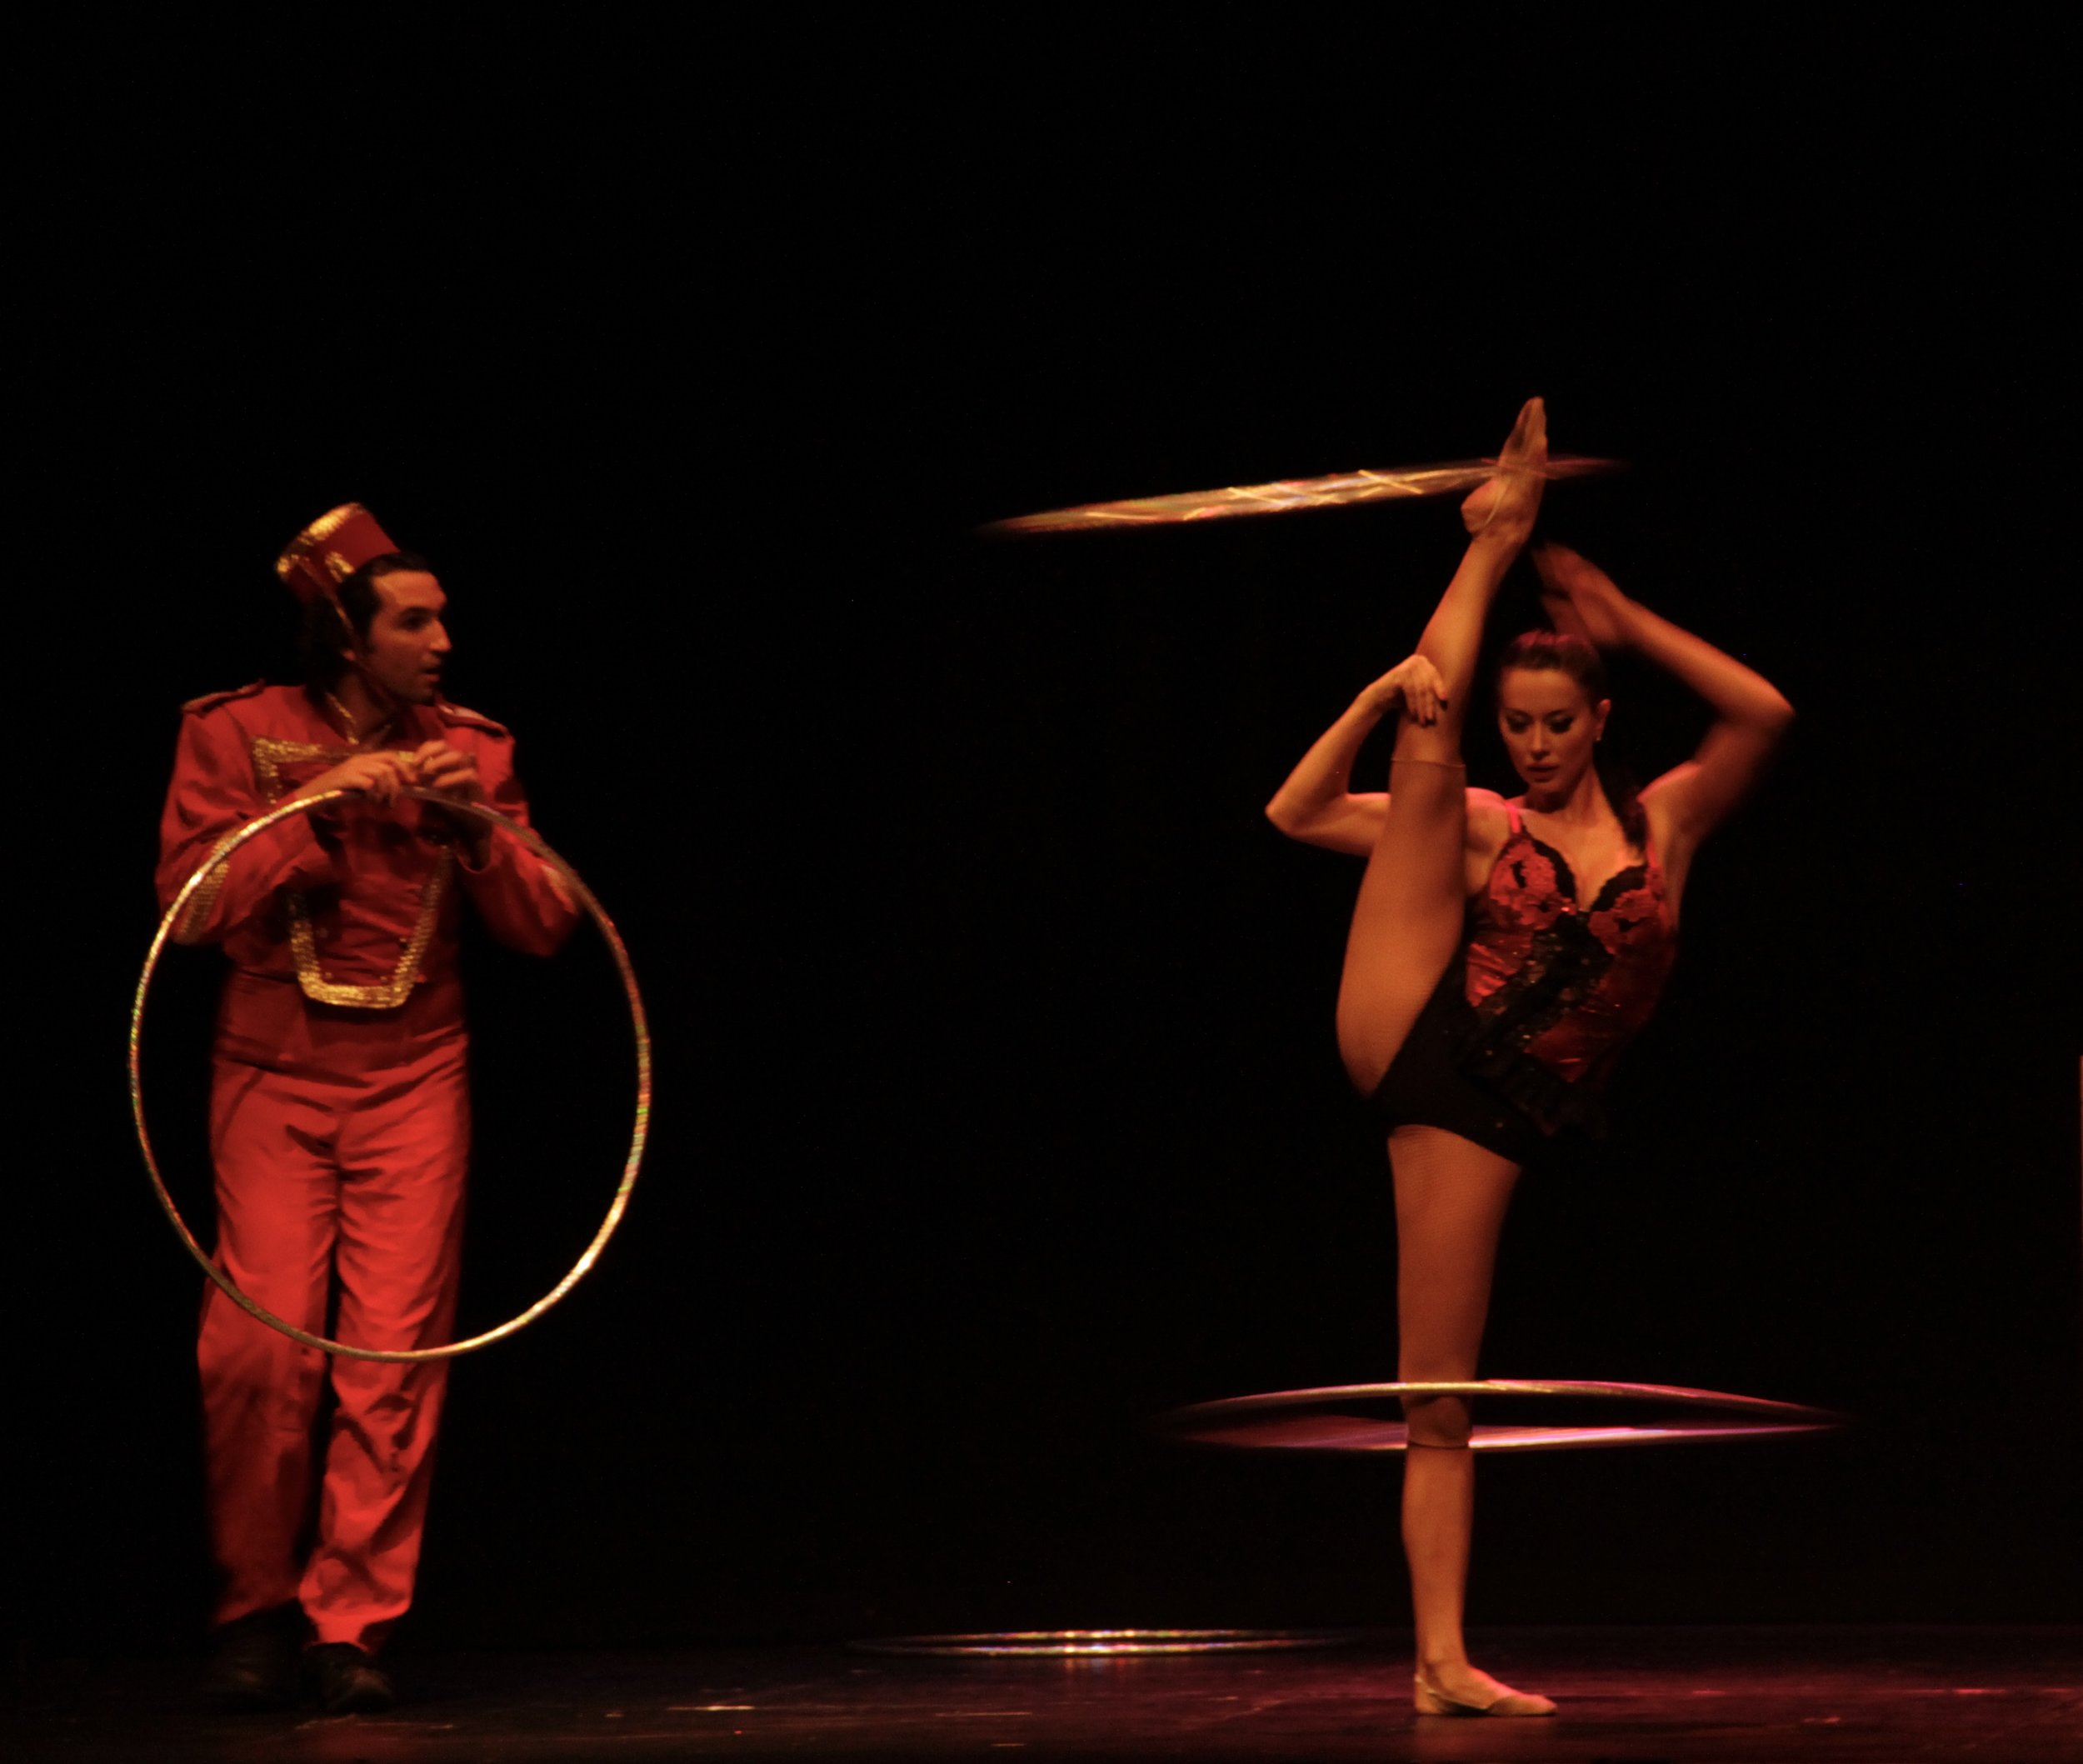 AcroEvents Cabaret y Circo The Hotel Marta Gutierrez